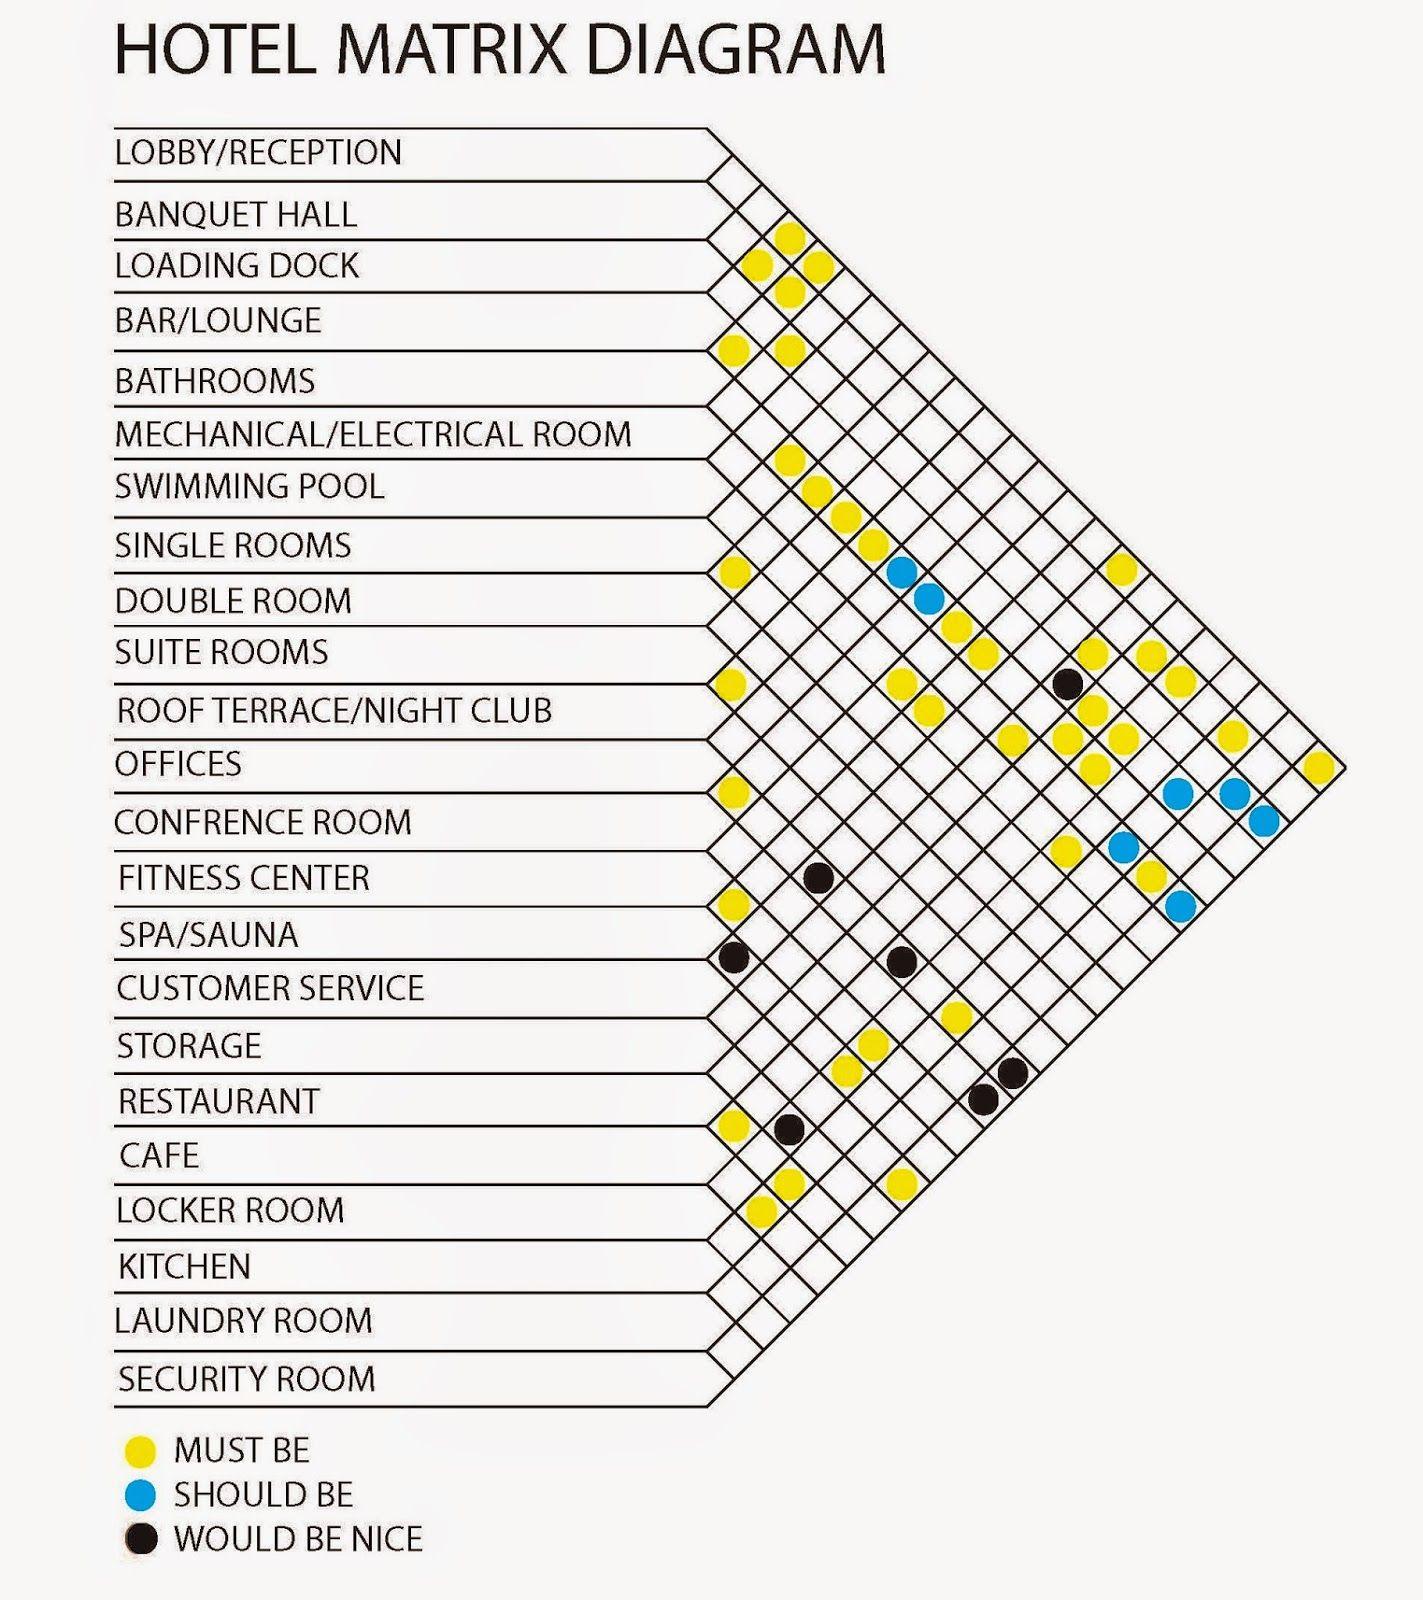 Hotel Matrix Diagram